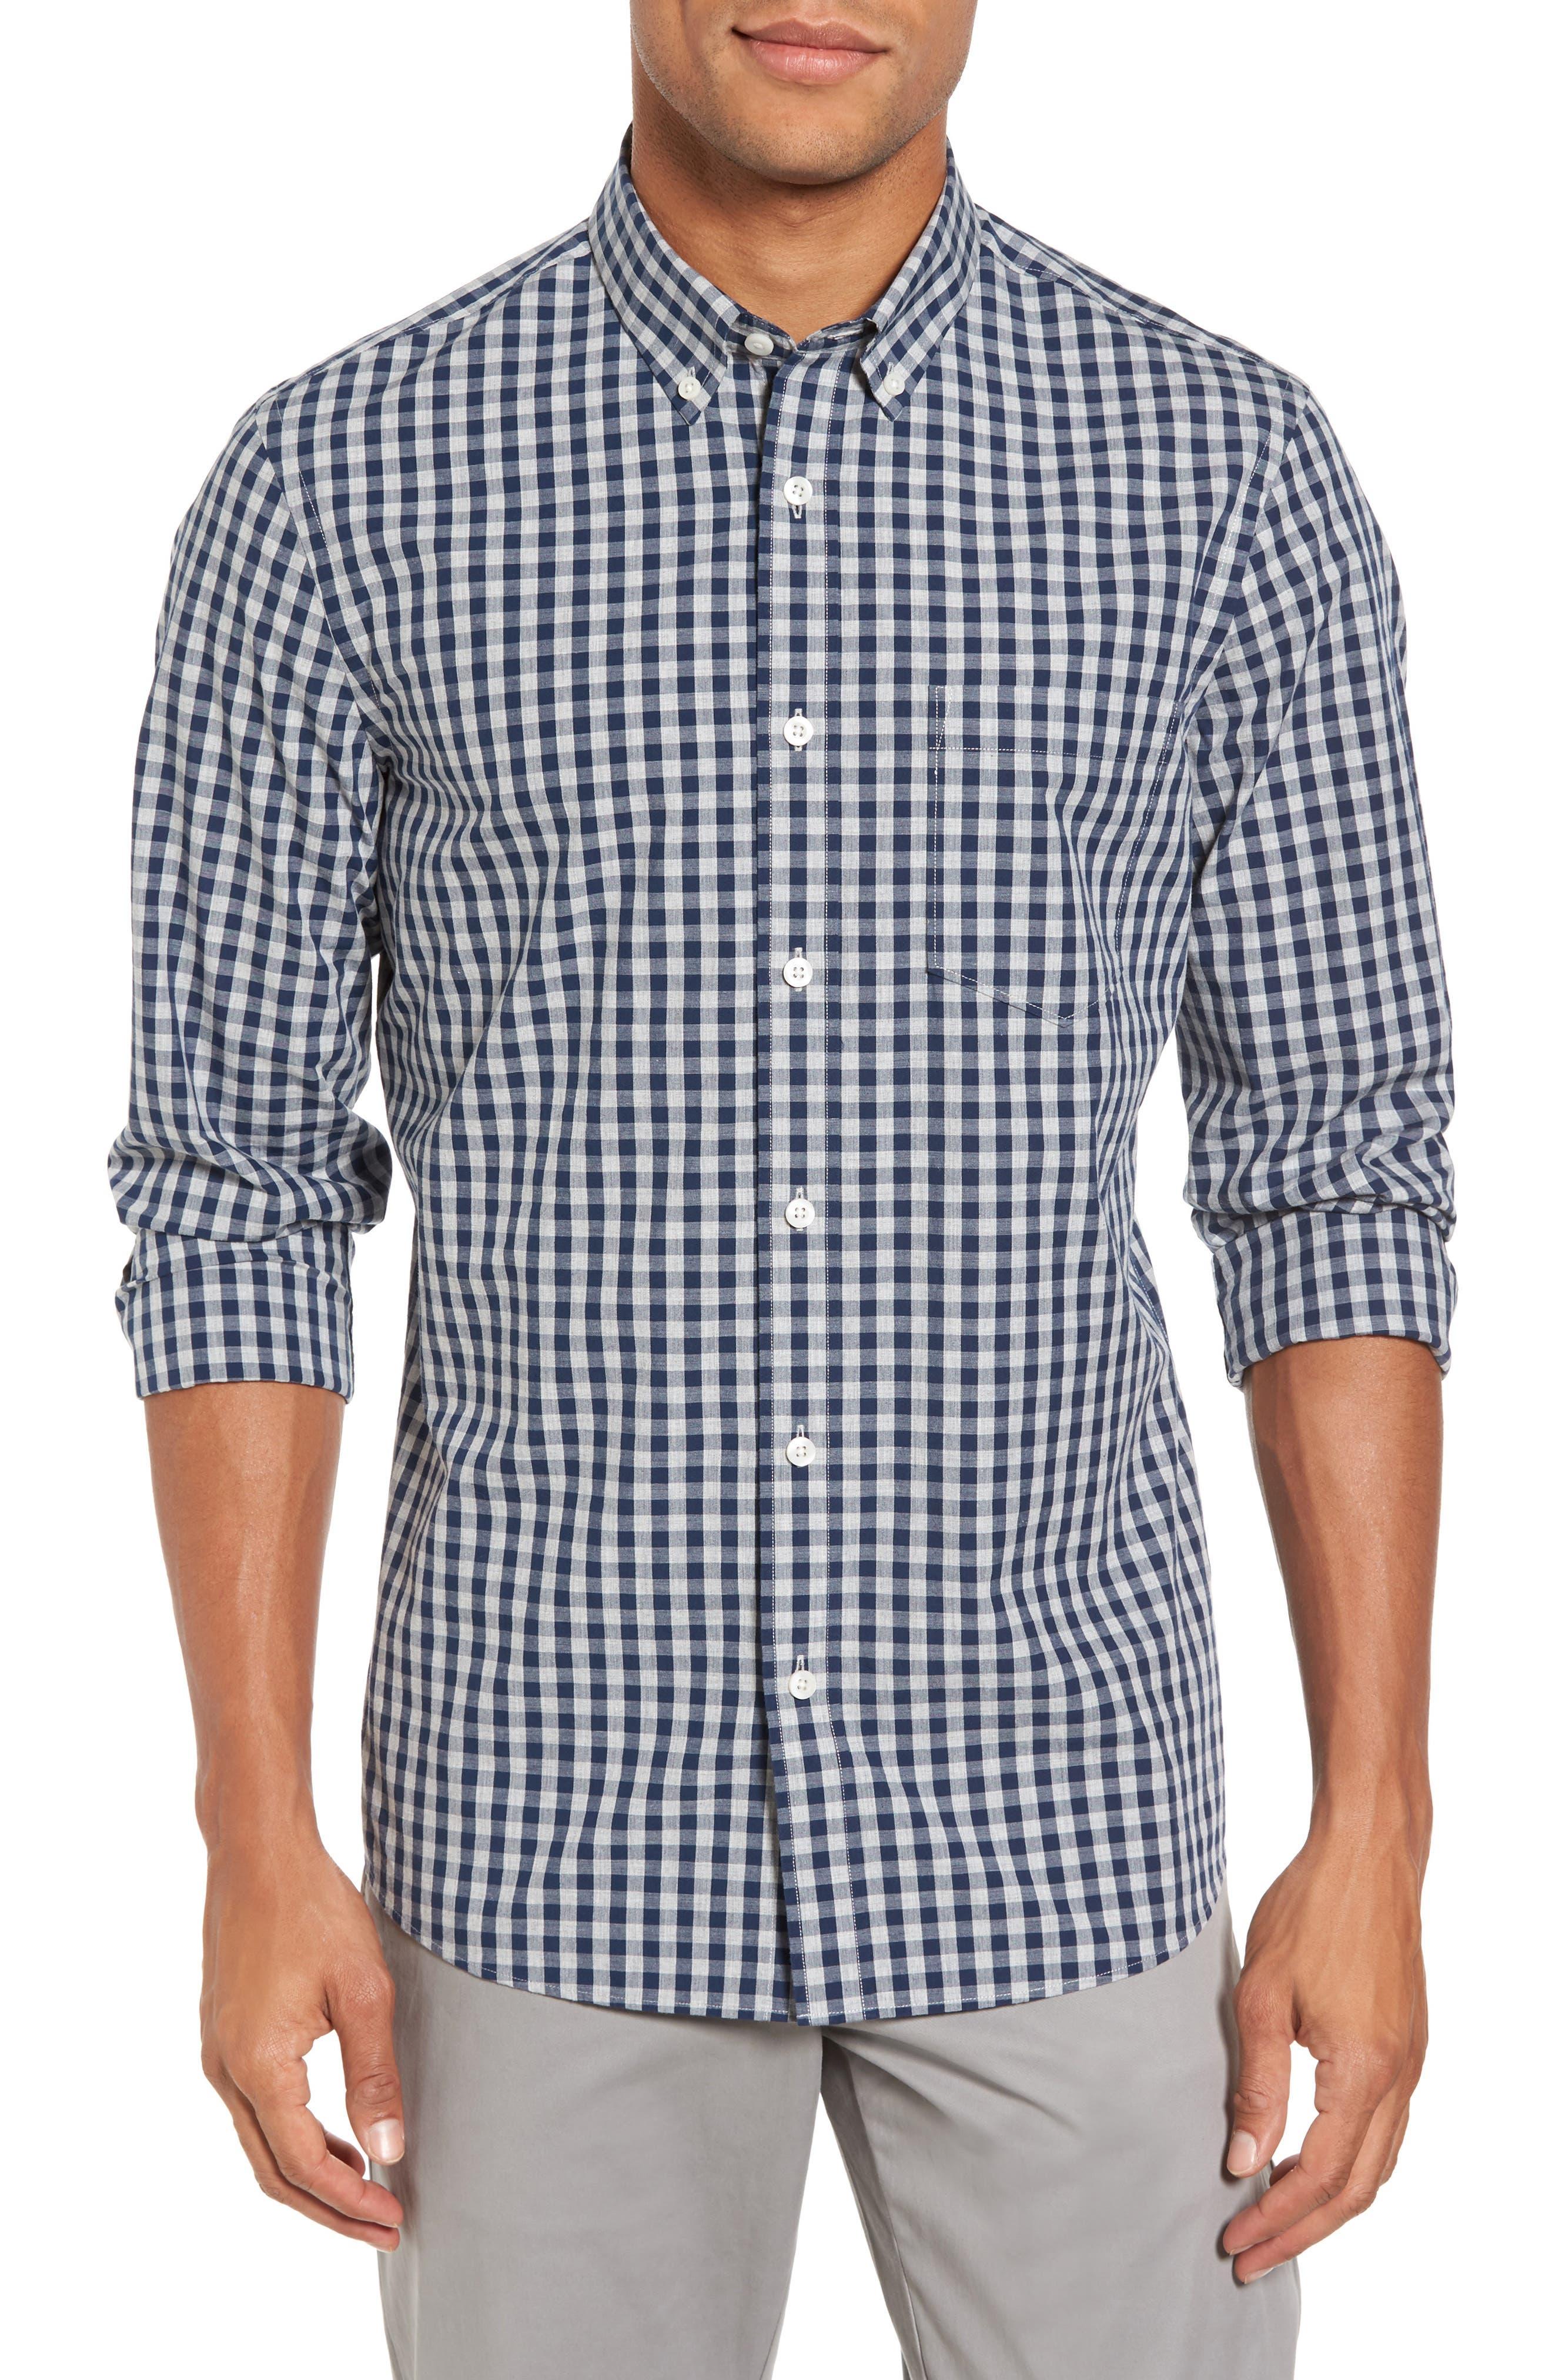 Main Image - Nordstrom Men's Shop Spade Trim Fit Gingham Check Sport Shirt